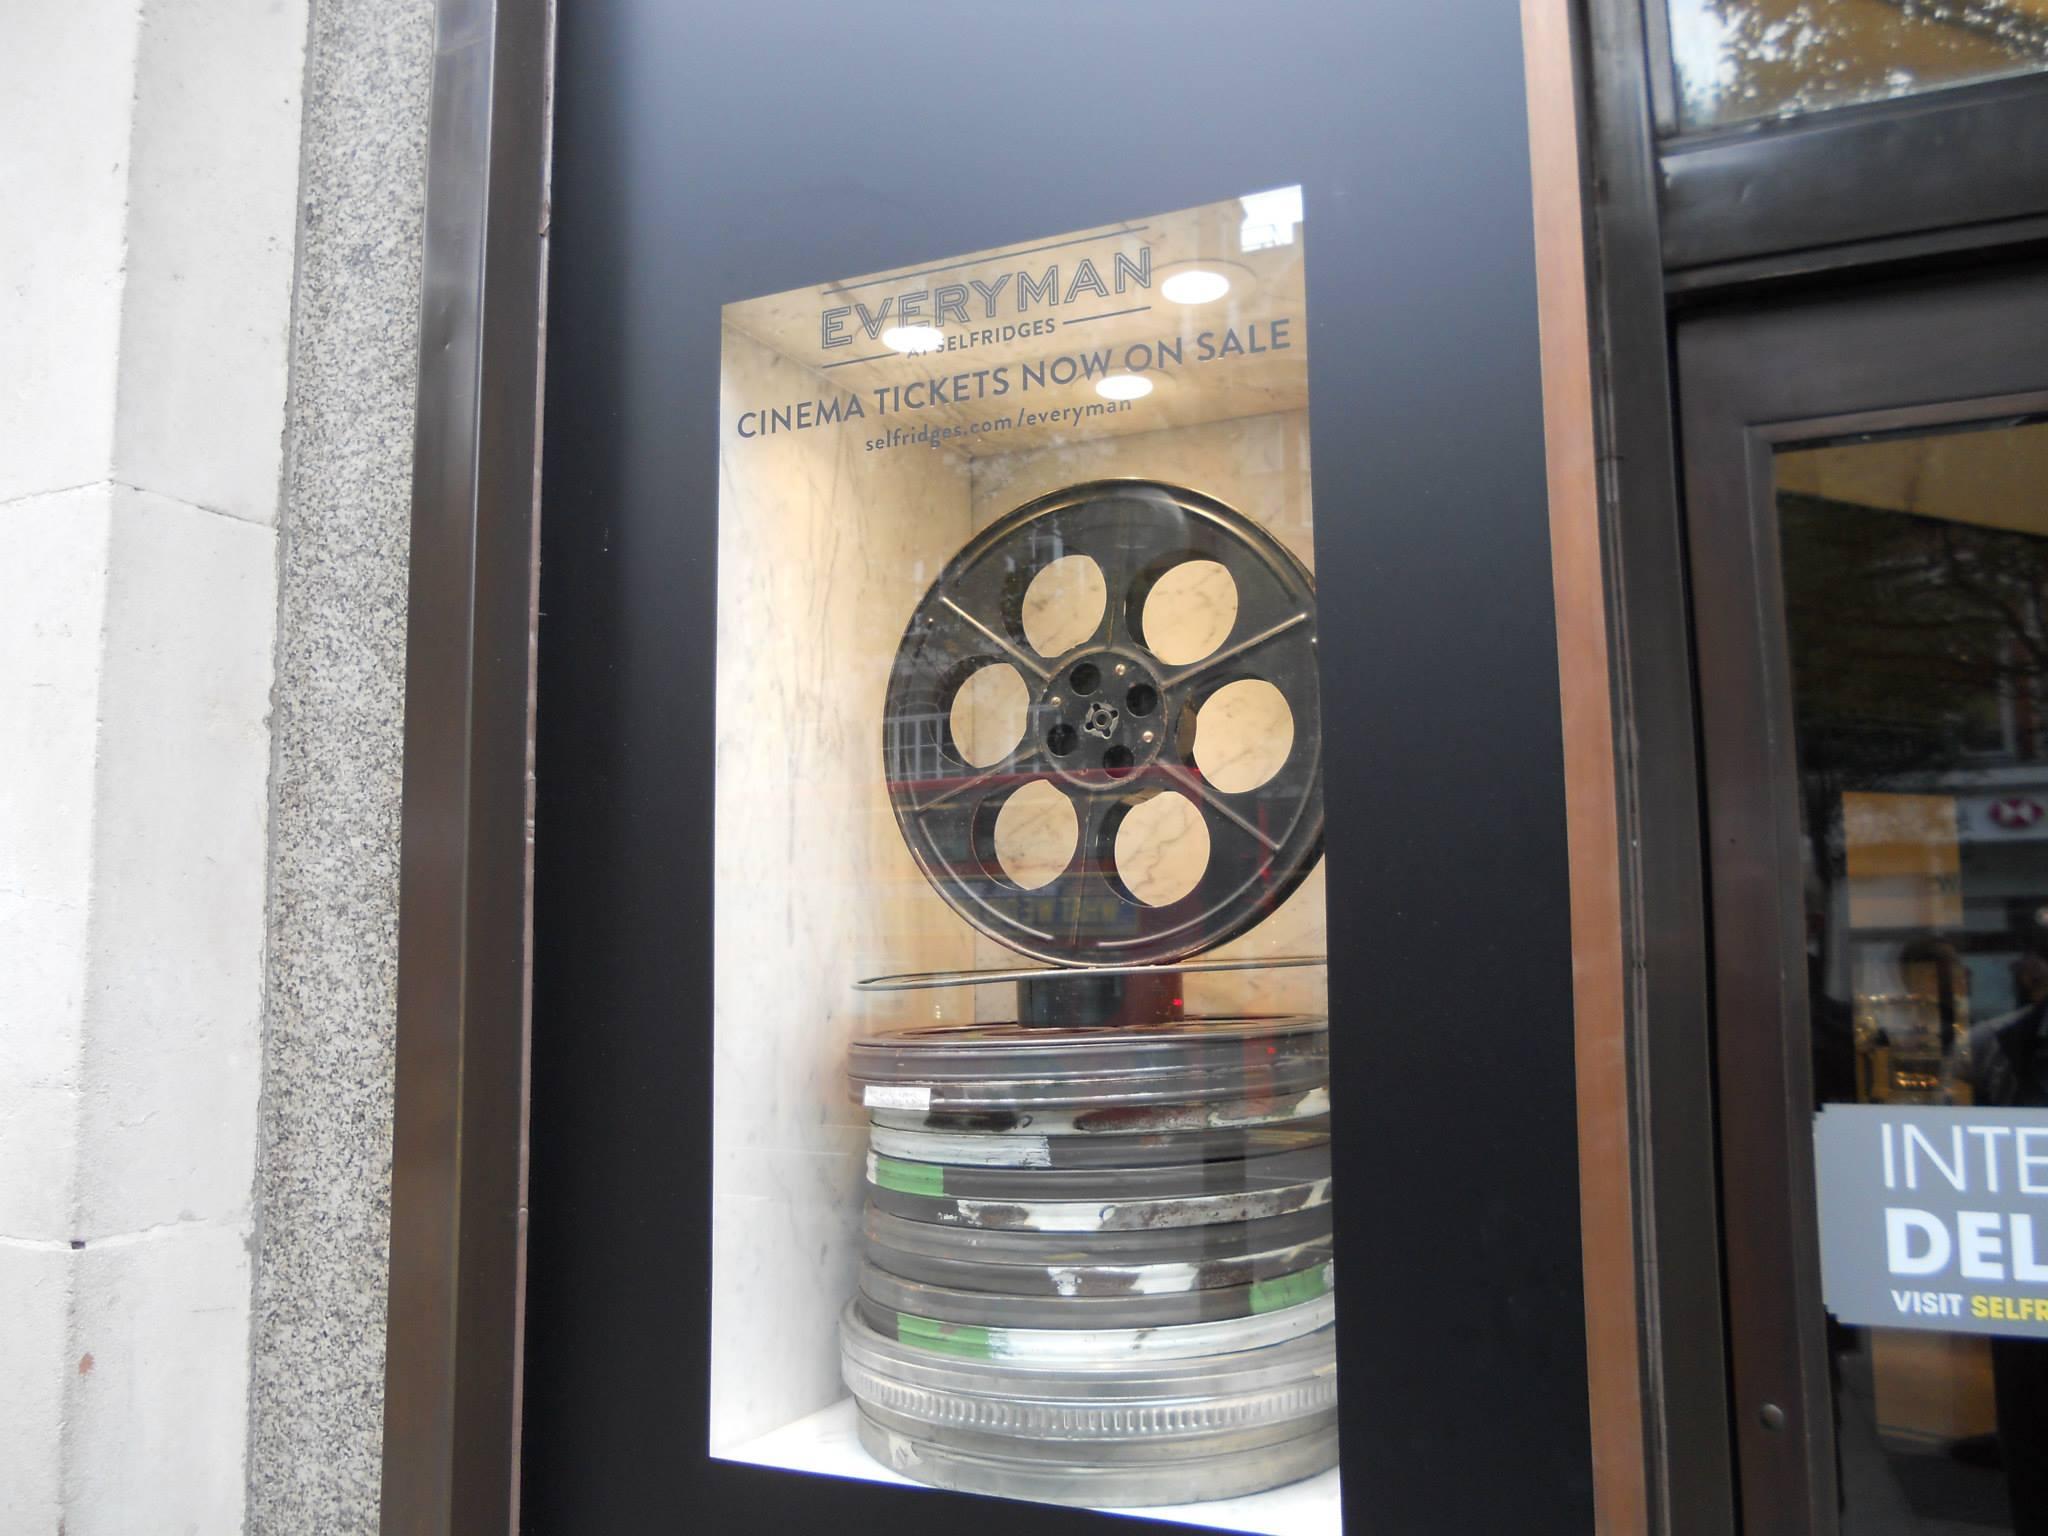 selfridges-everyman-cinema-open-for-business